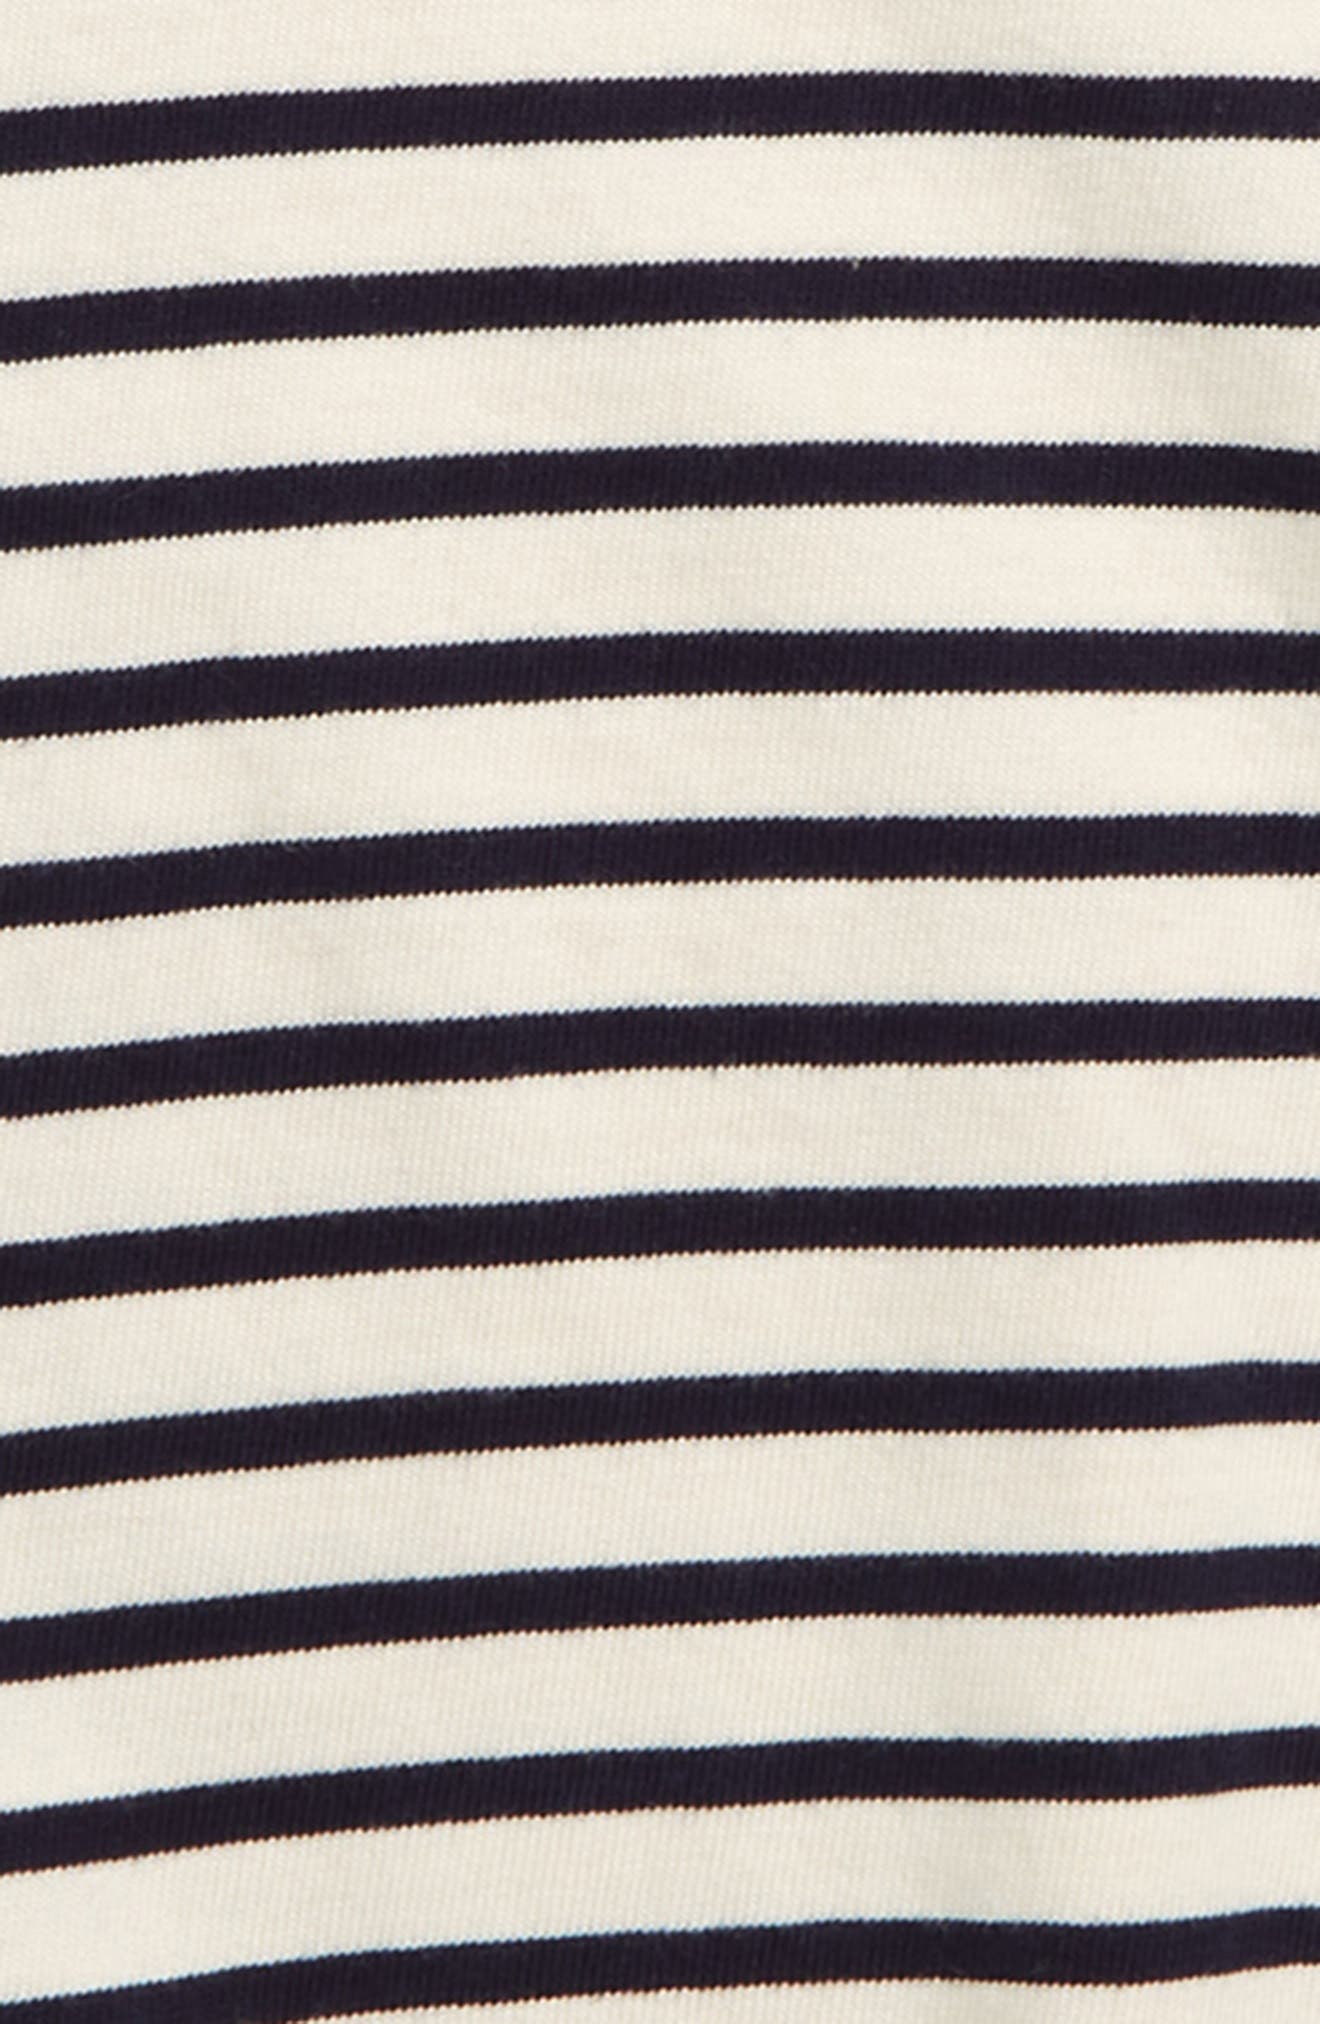 TREASURE & BOND, Puff Sleeve Top, Alternate thumbnail 2, color, IVORY ANTIQUE- NAVY BRETON